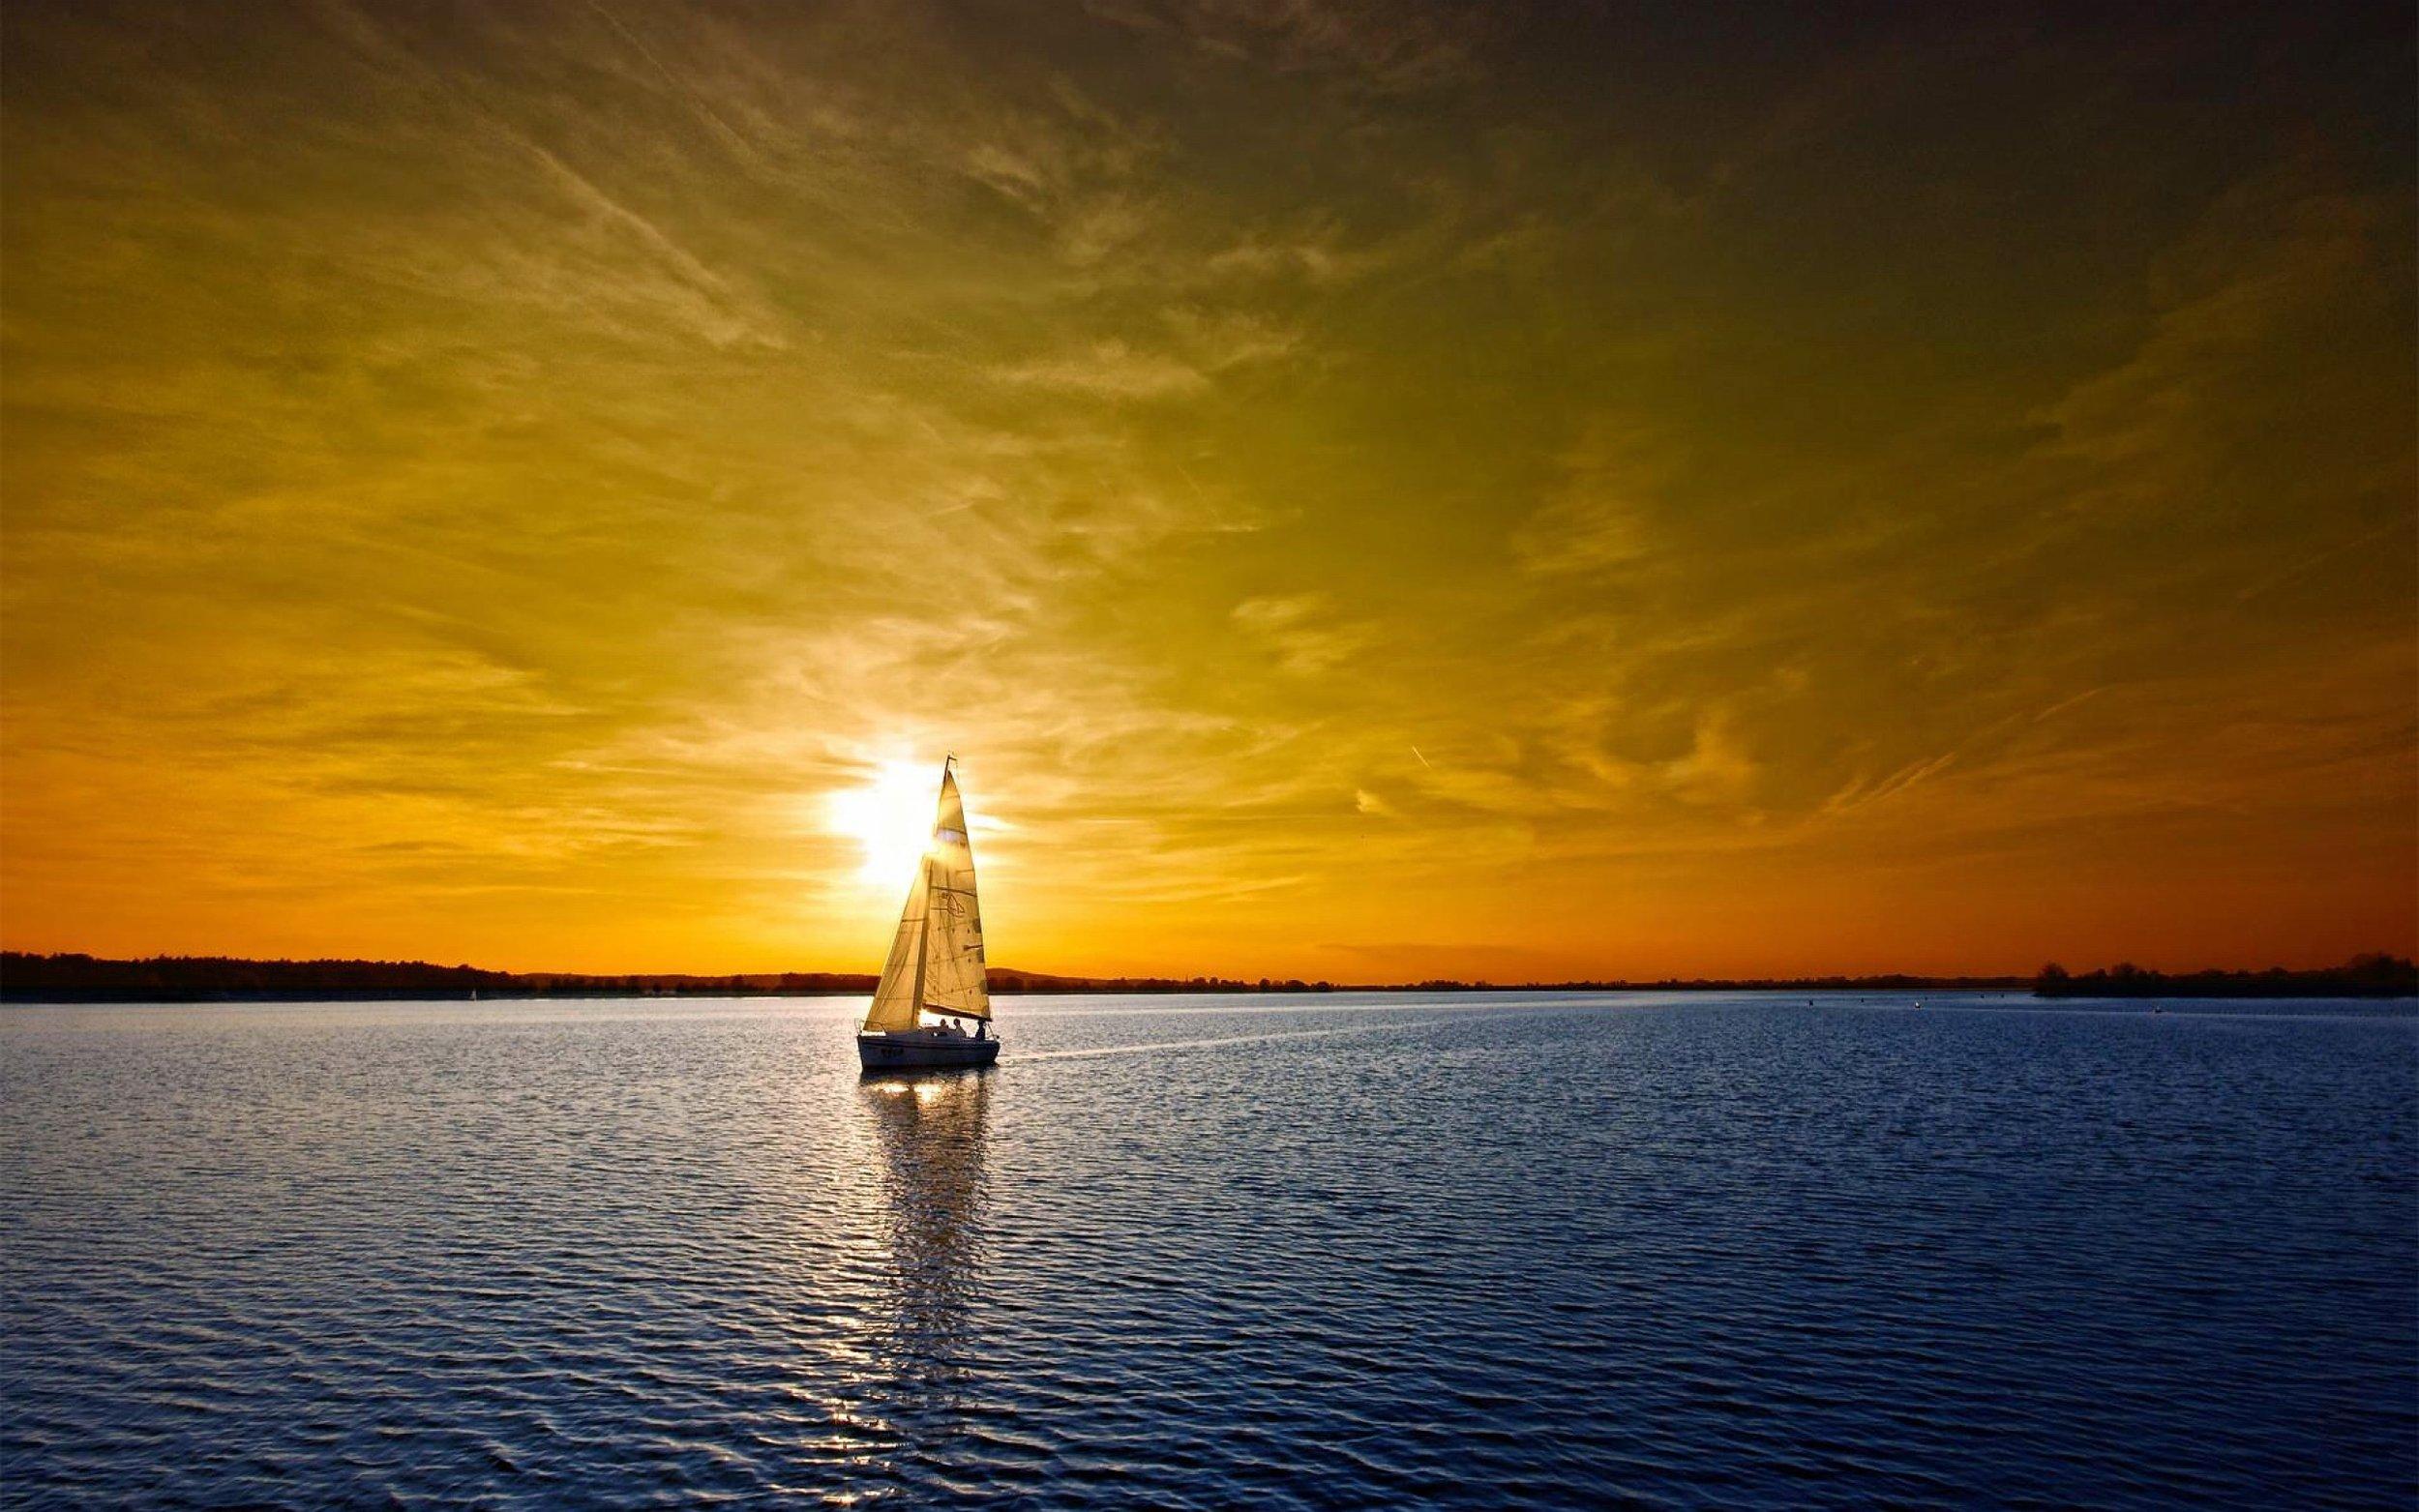 sail-boat-sunset-lake-hd-wallpaper.jpg